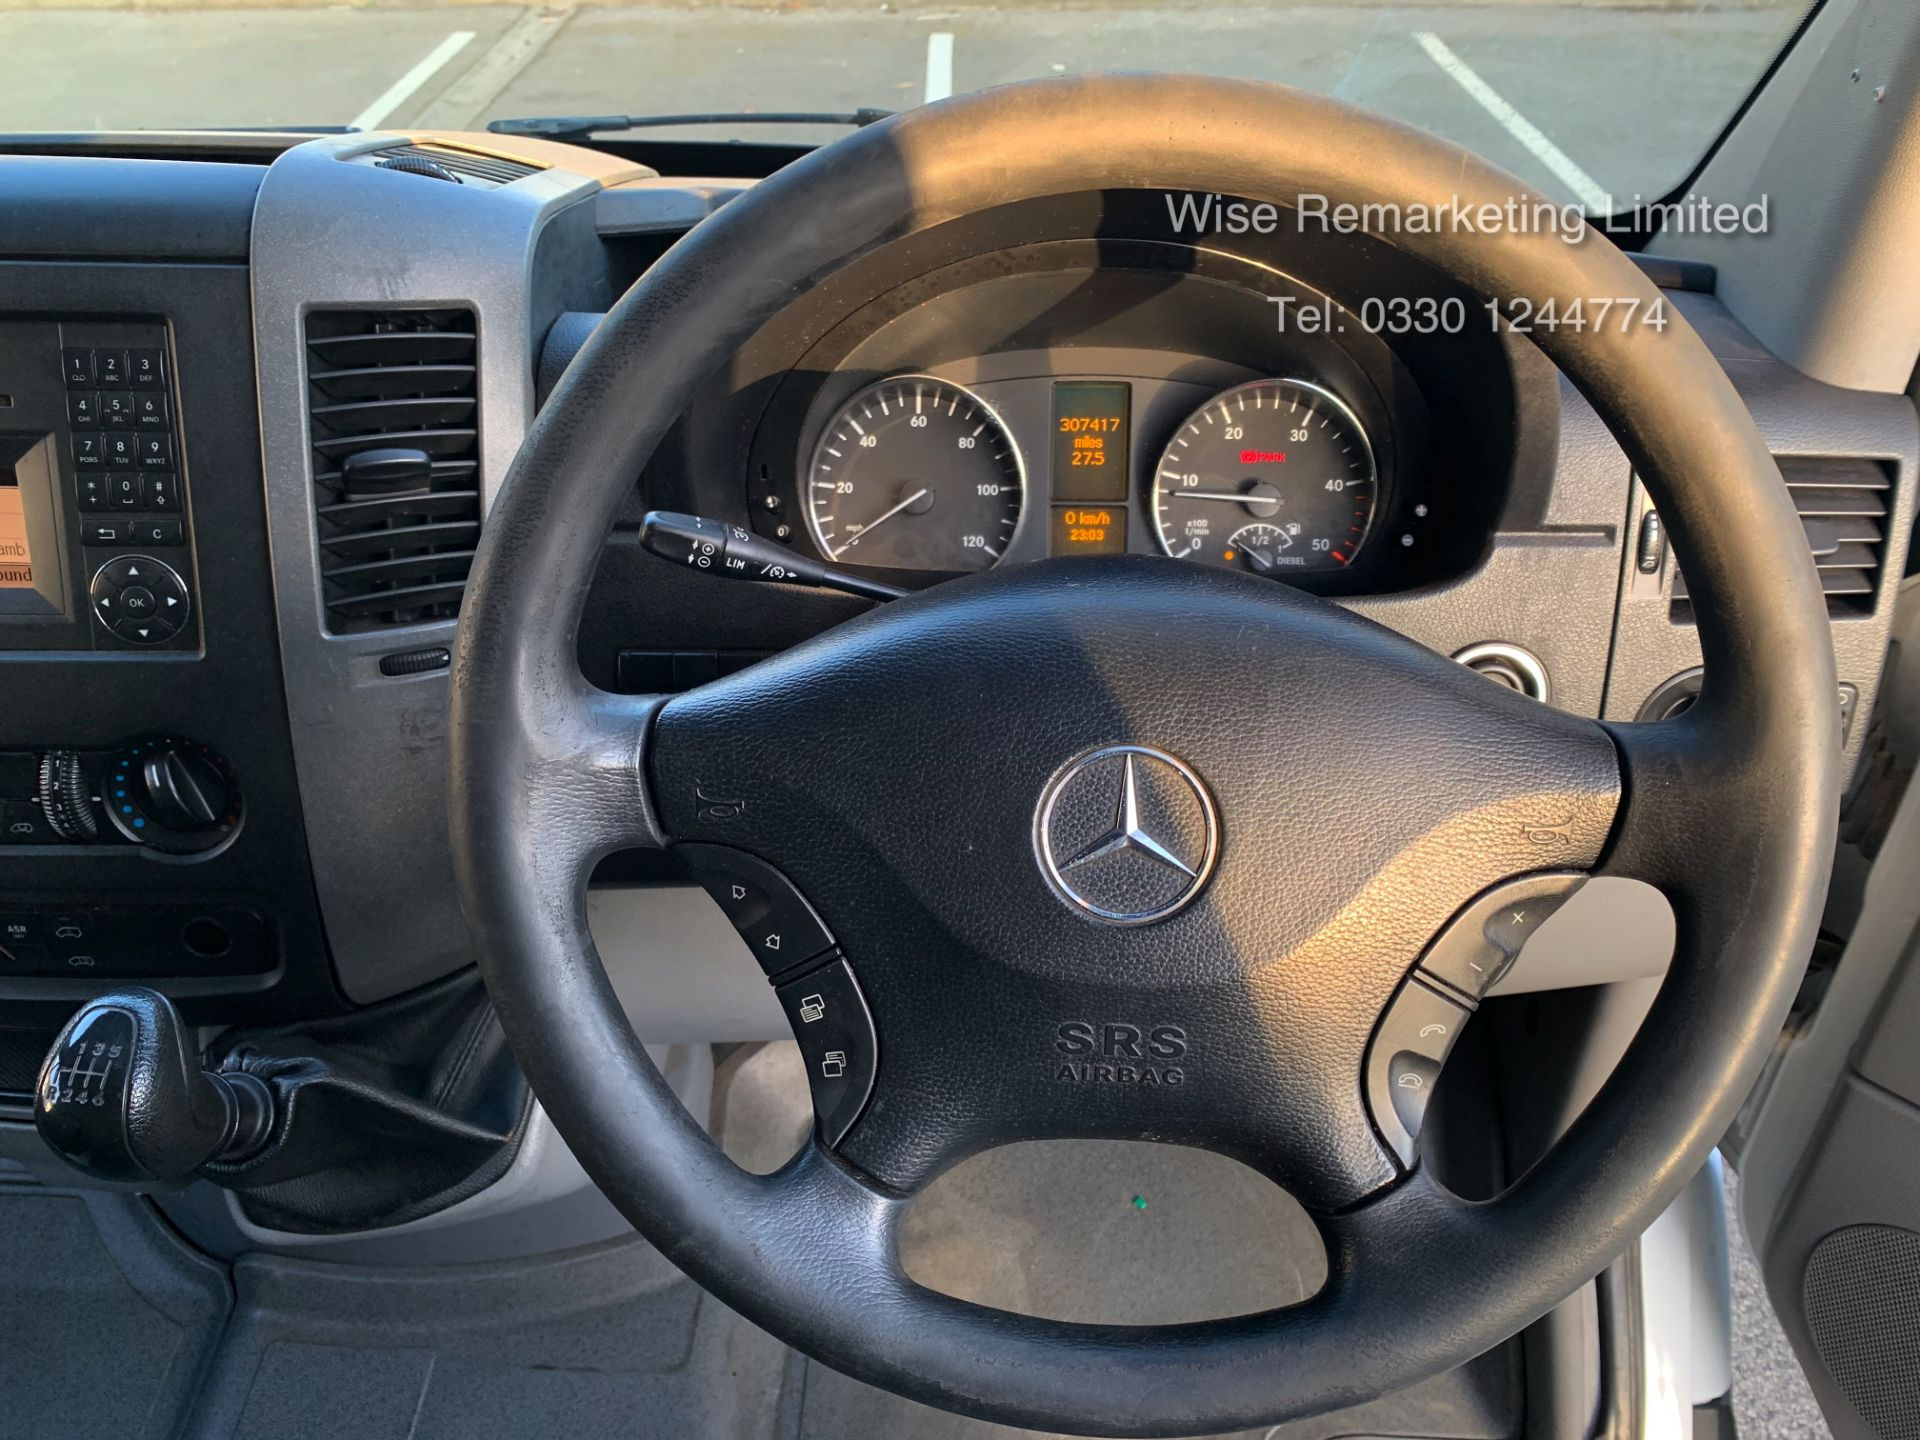 Lot 17 - Mercedes Sprinter 316 2.1 CDI Long Wheel Base High Roof Van - 2013 13 Reg -